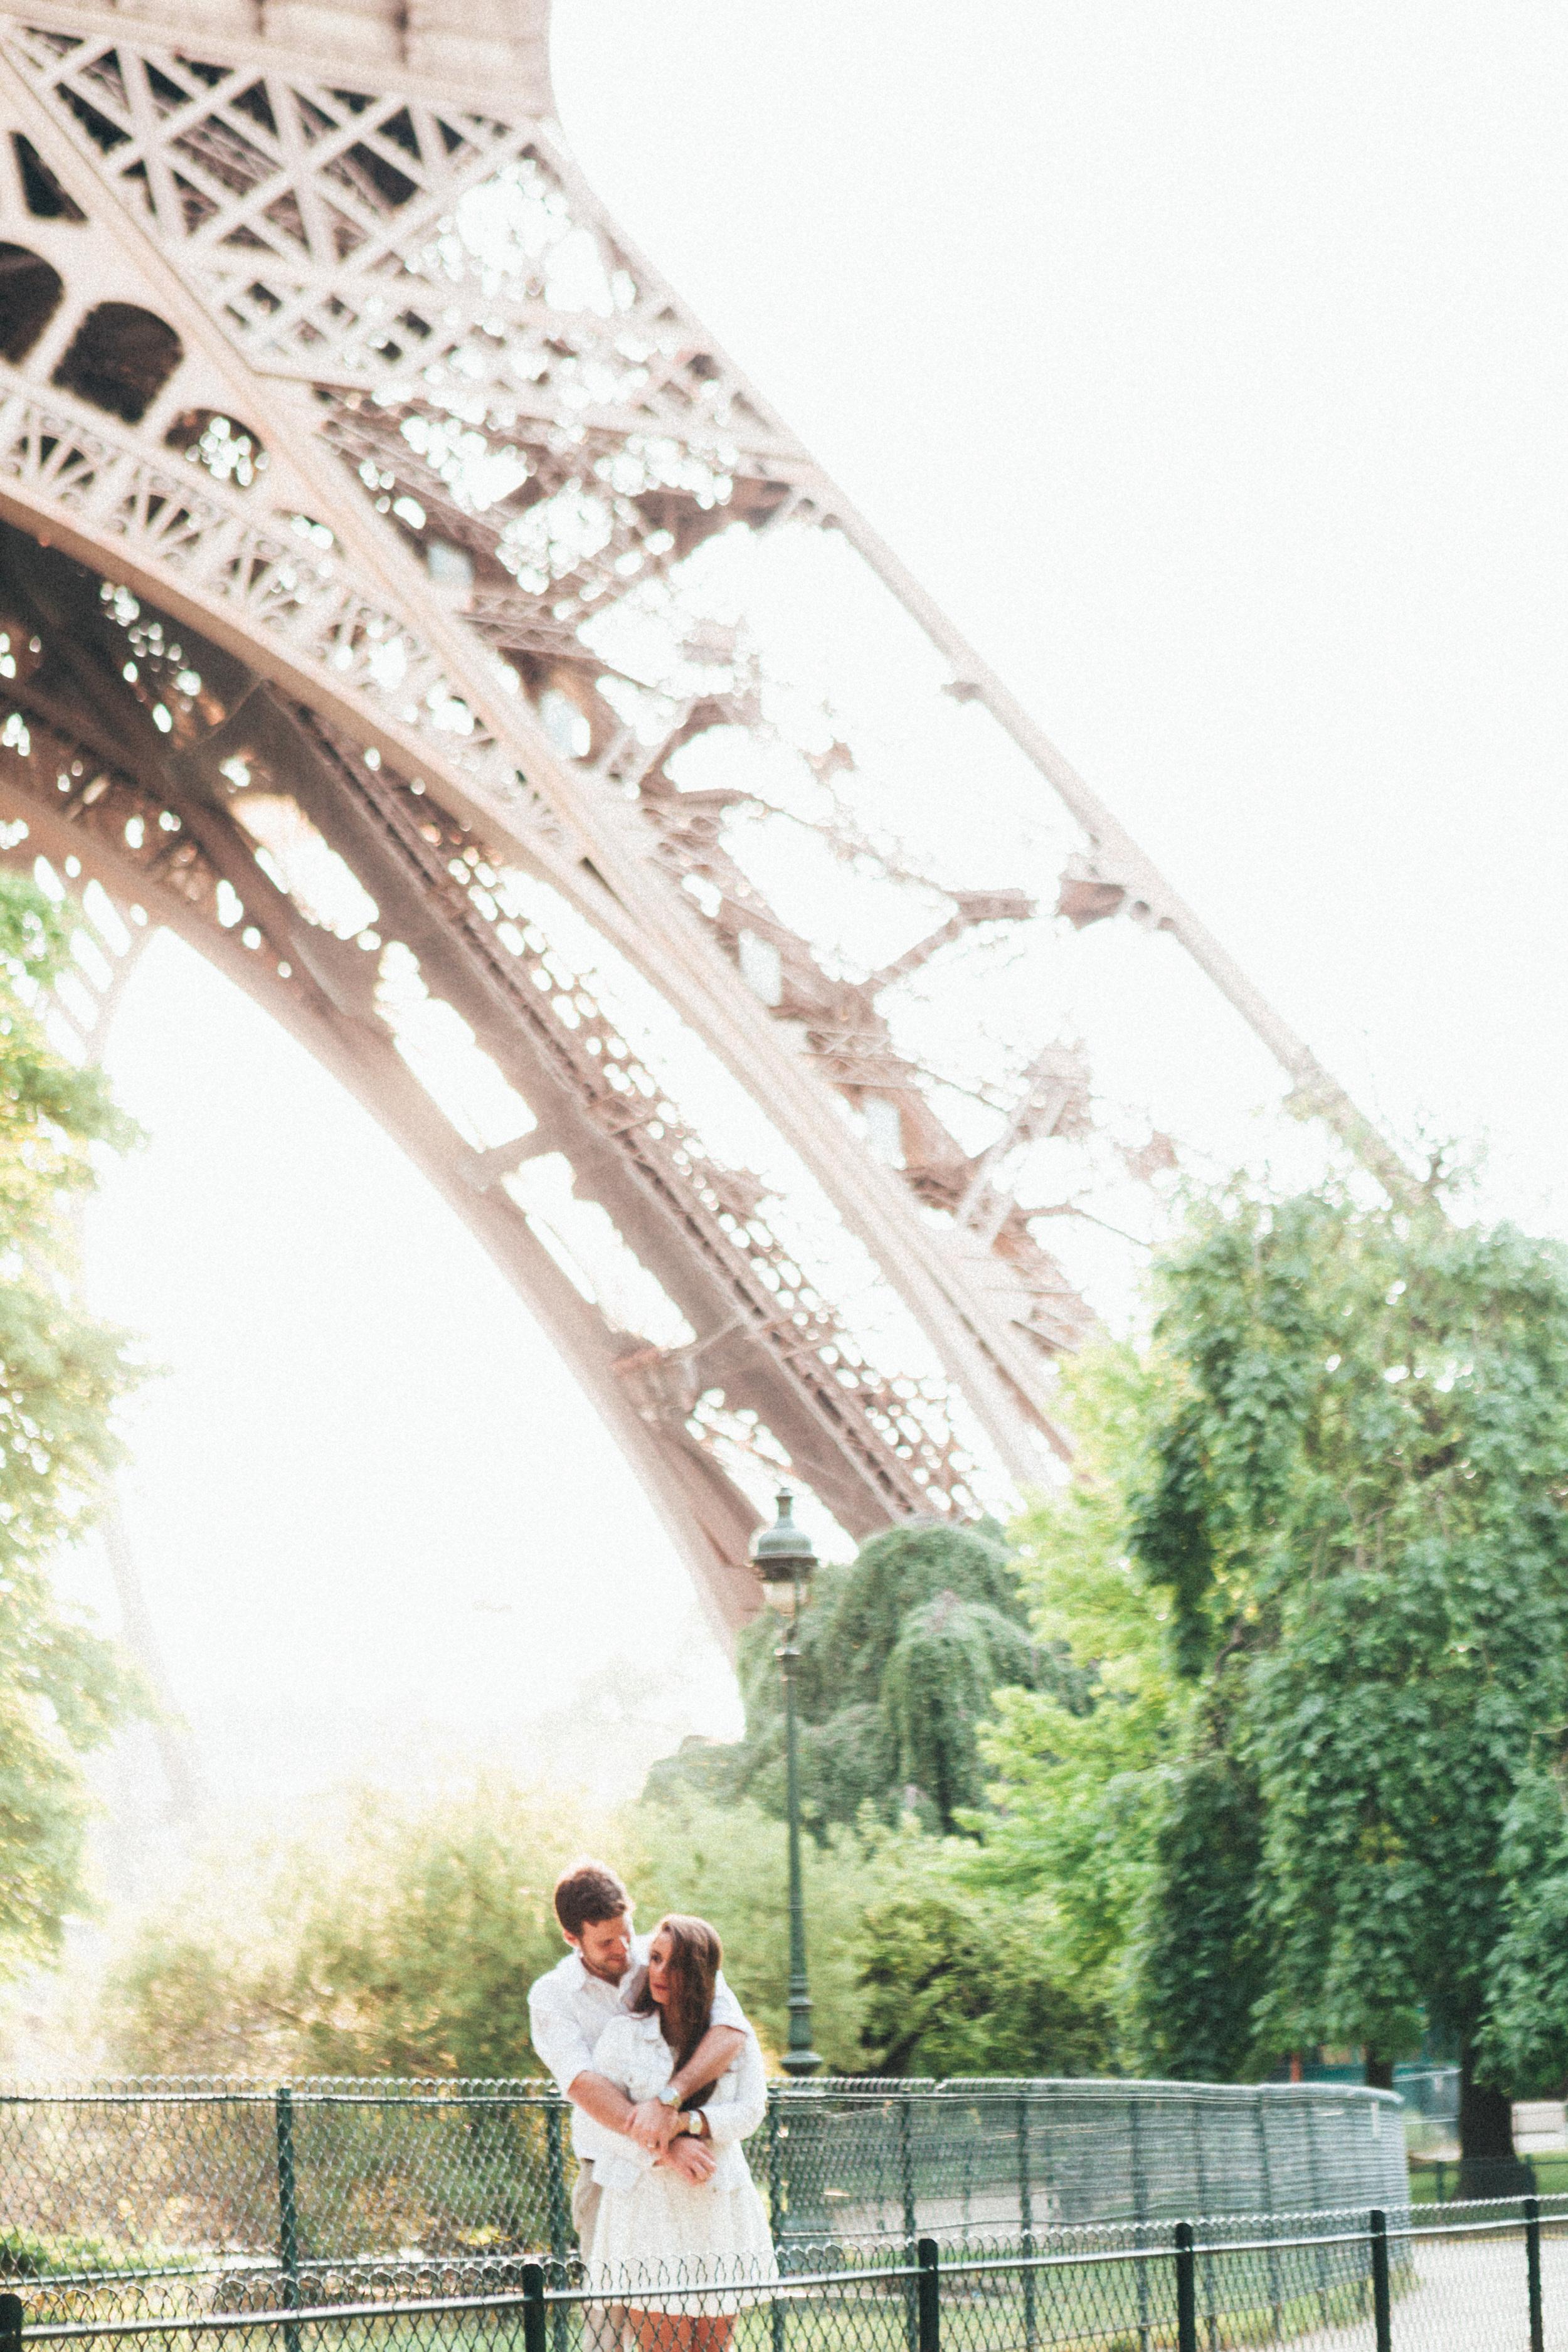 Photographer in Paris Eiffel Tower Love Lovebirds Trocadero SweetKiss Iheartparisfr